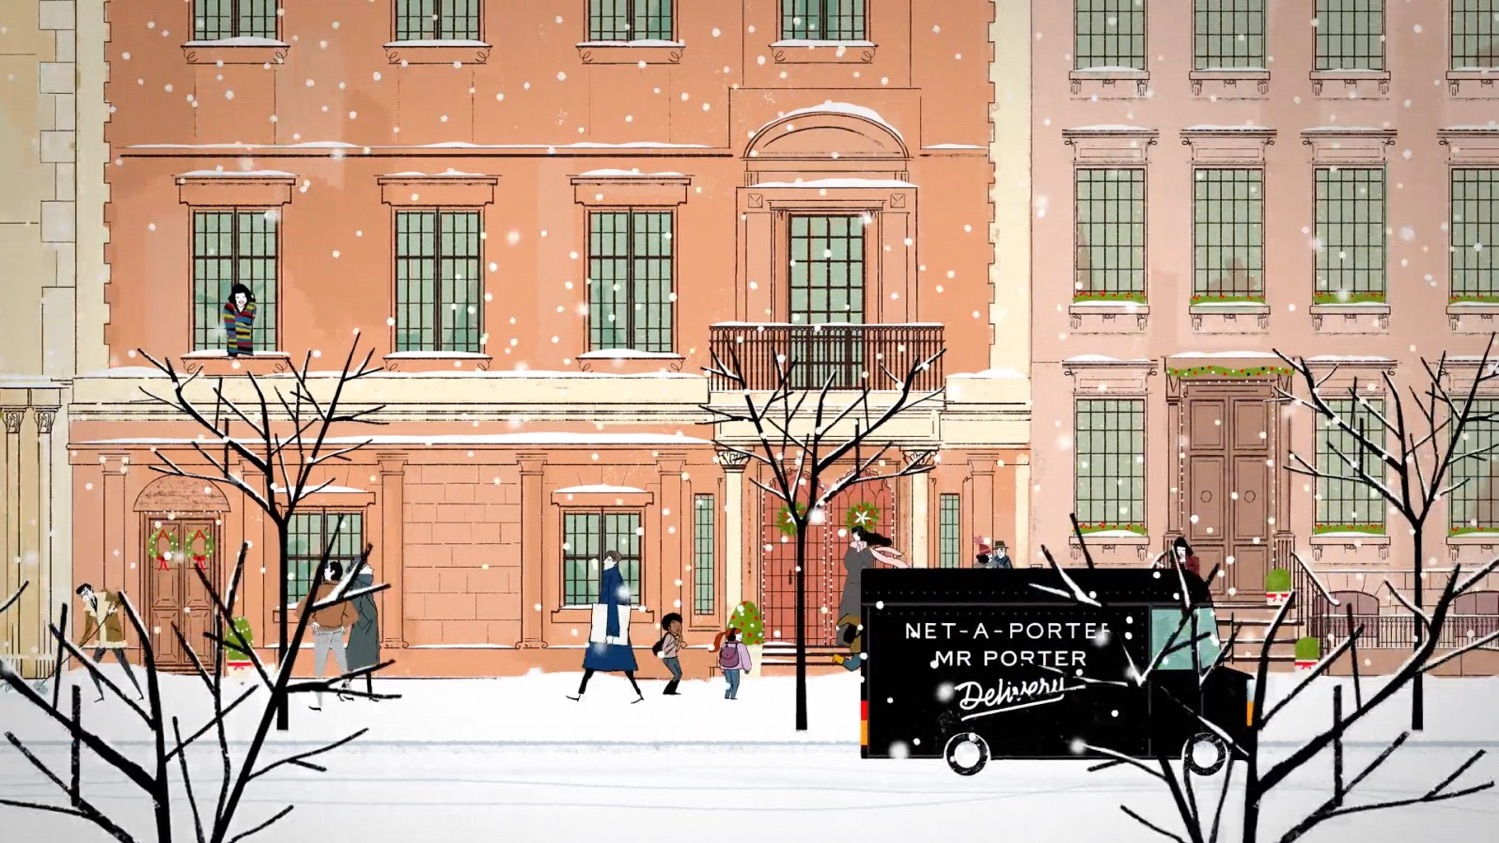 Mr Porter - Illustration & Design by Simone Massoni